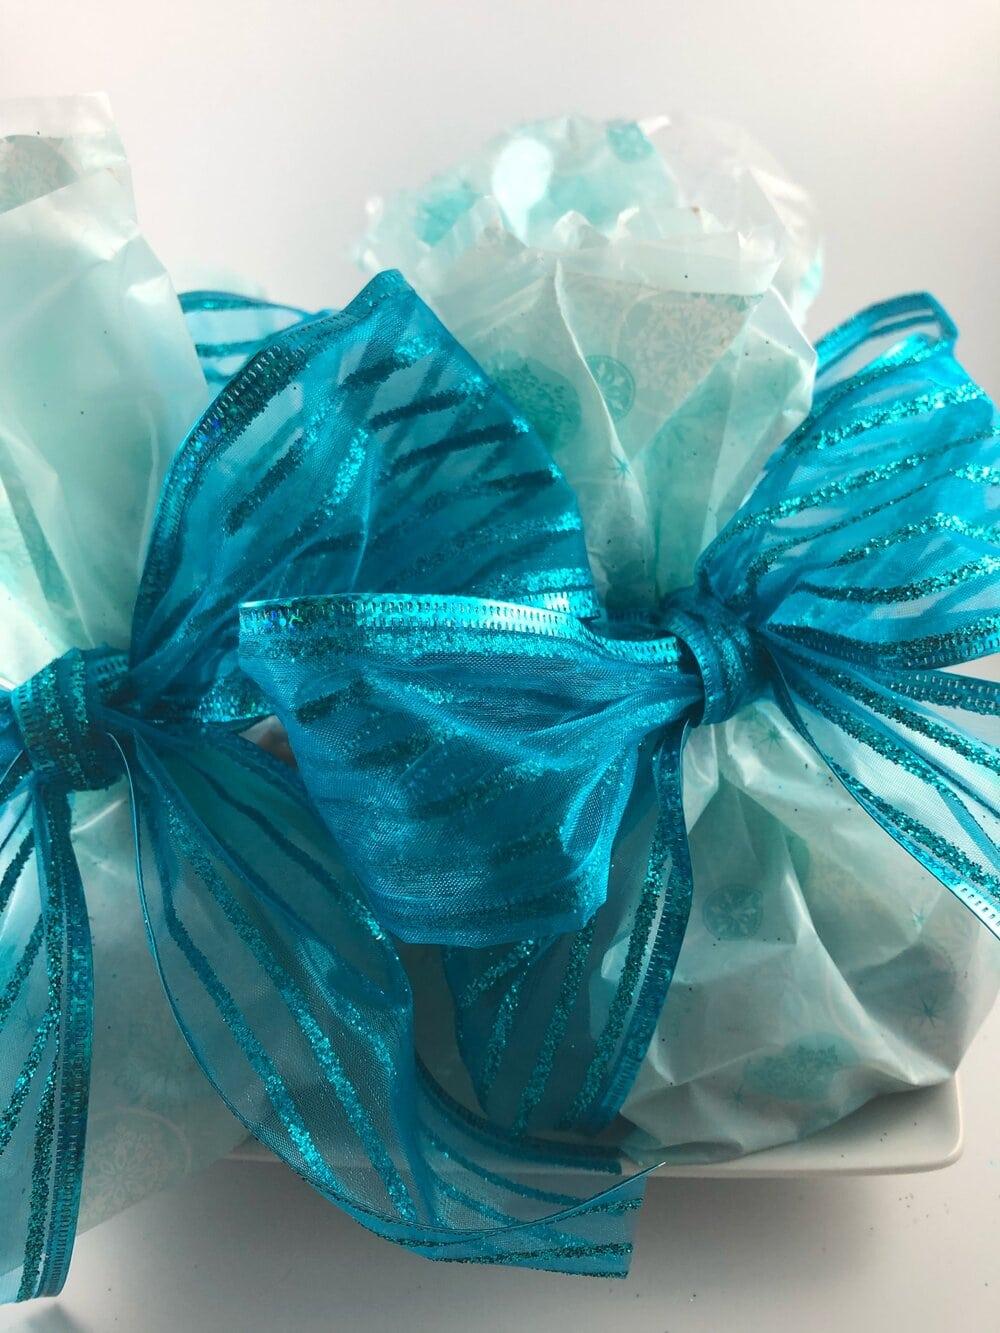 Missouri girl edible gifts. Missouri girl blog.